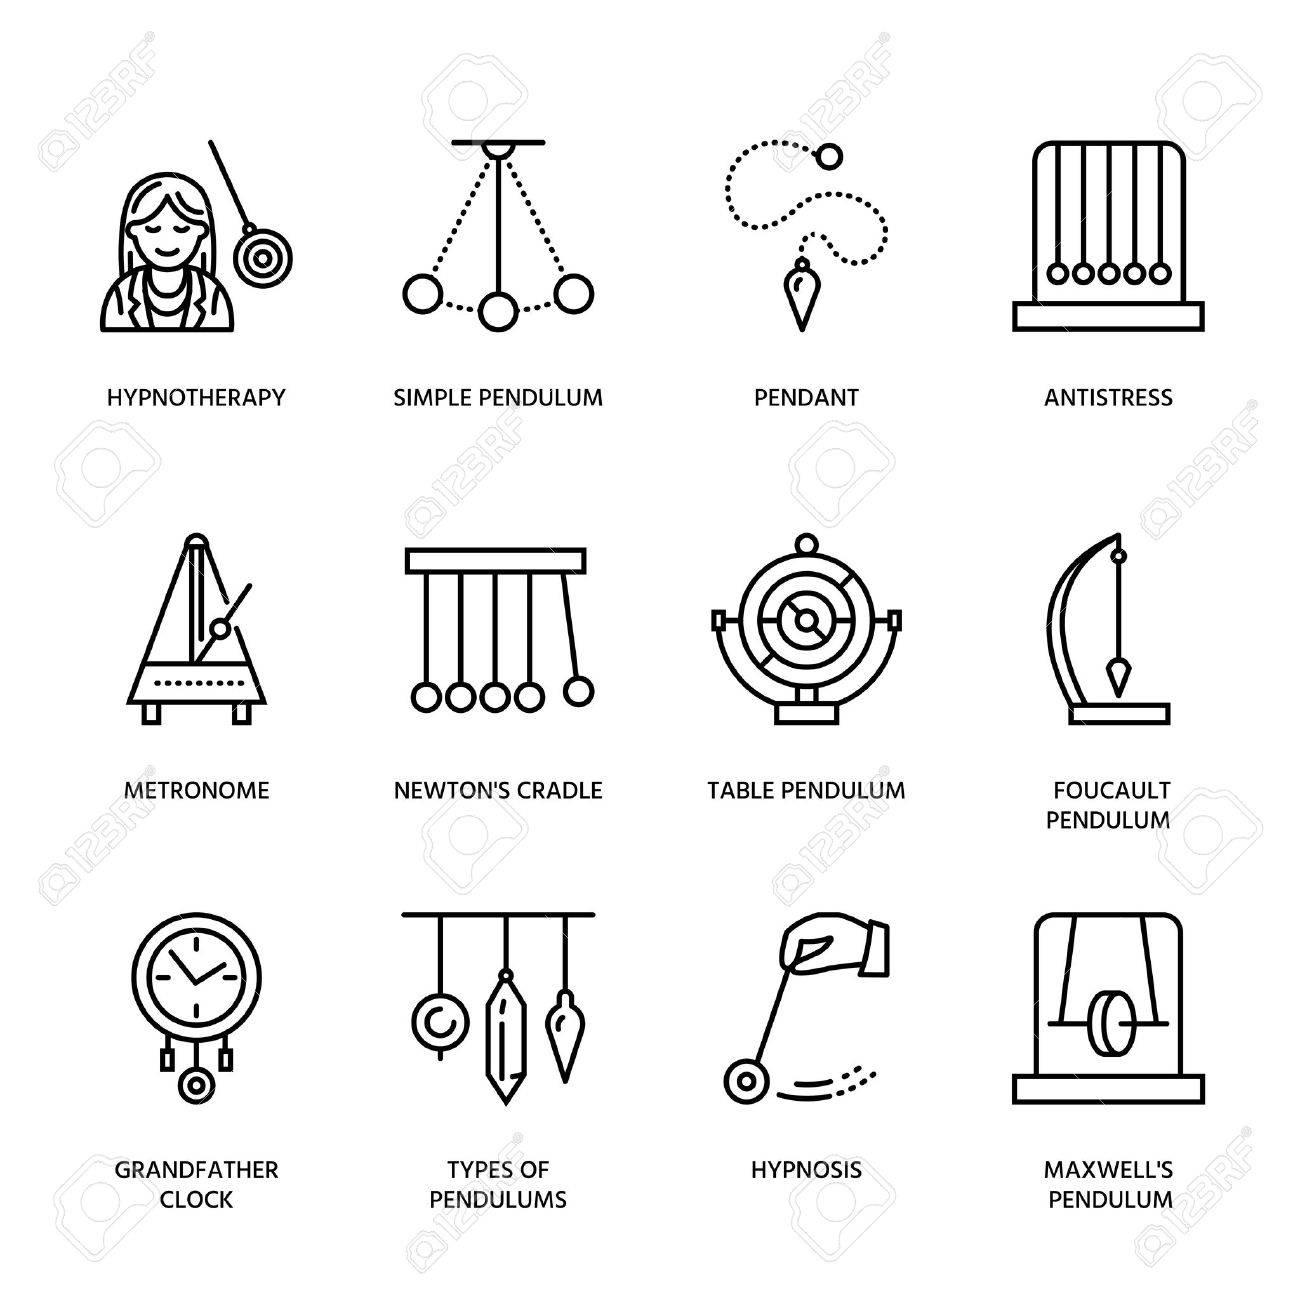 Vector line icon of pendulum types. Newton cradle, metronome, table pendulum, perpetuum mobile, gyroscope. Linear pictogram editable stroke for site, brochure of hypnosis, hypnotherapy. Pendulum logo. - 66482626